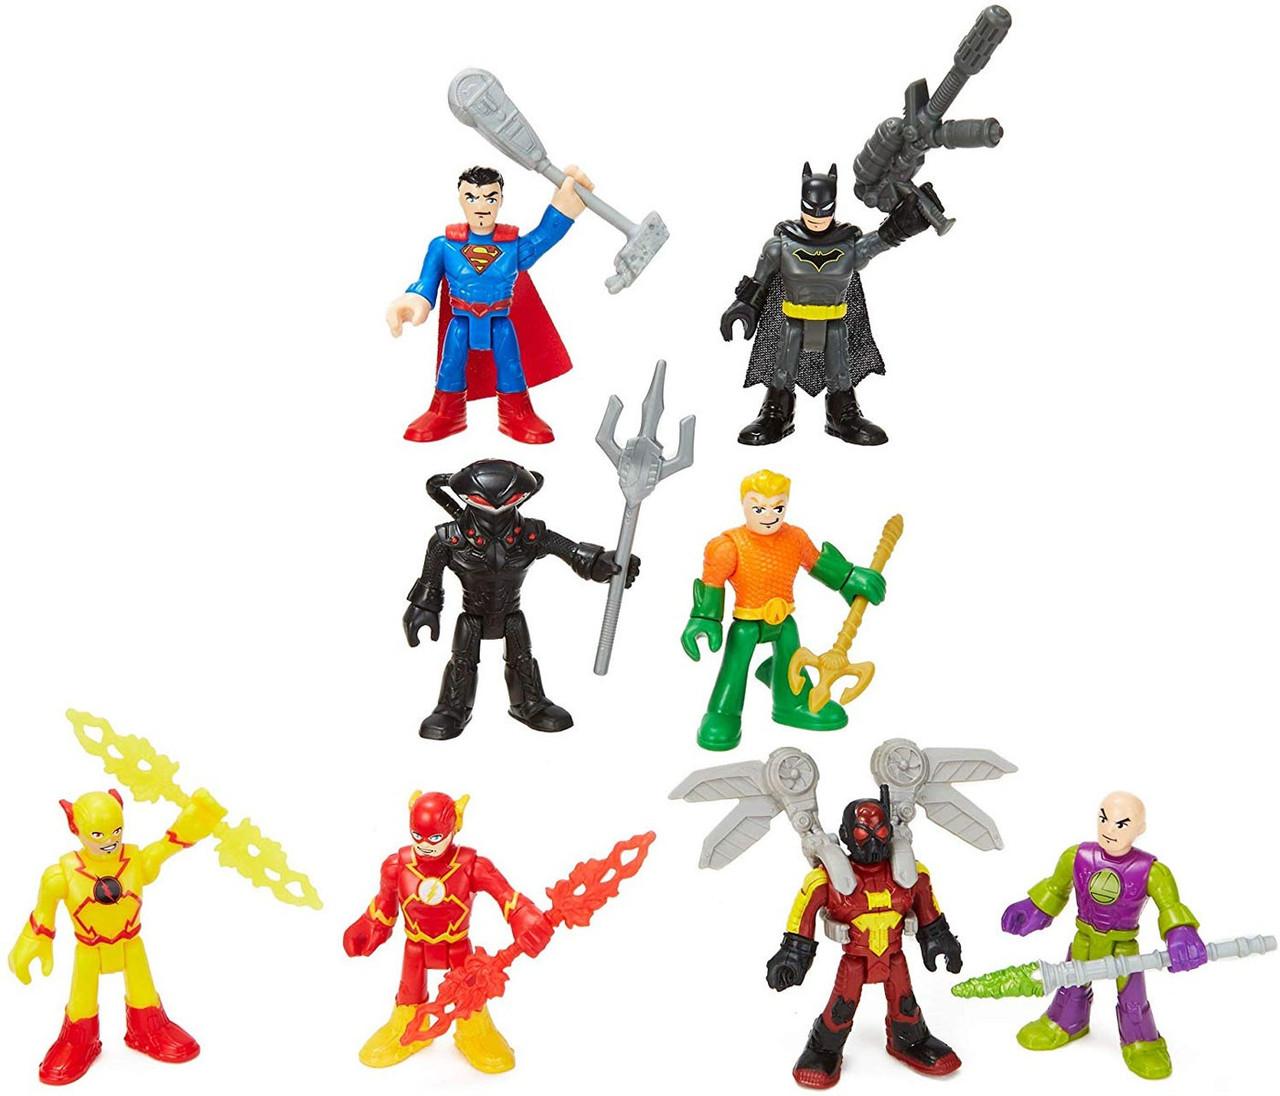 Fisher Price Dc Super Friends Imaginext Super Hero Showdown Superman Lex Luthor Batman Firefly Aquaman Flash Black Manta Reverse Flash Exclusive 3 Figure 8 Pack Set Toywiz